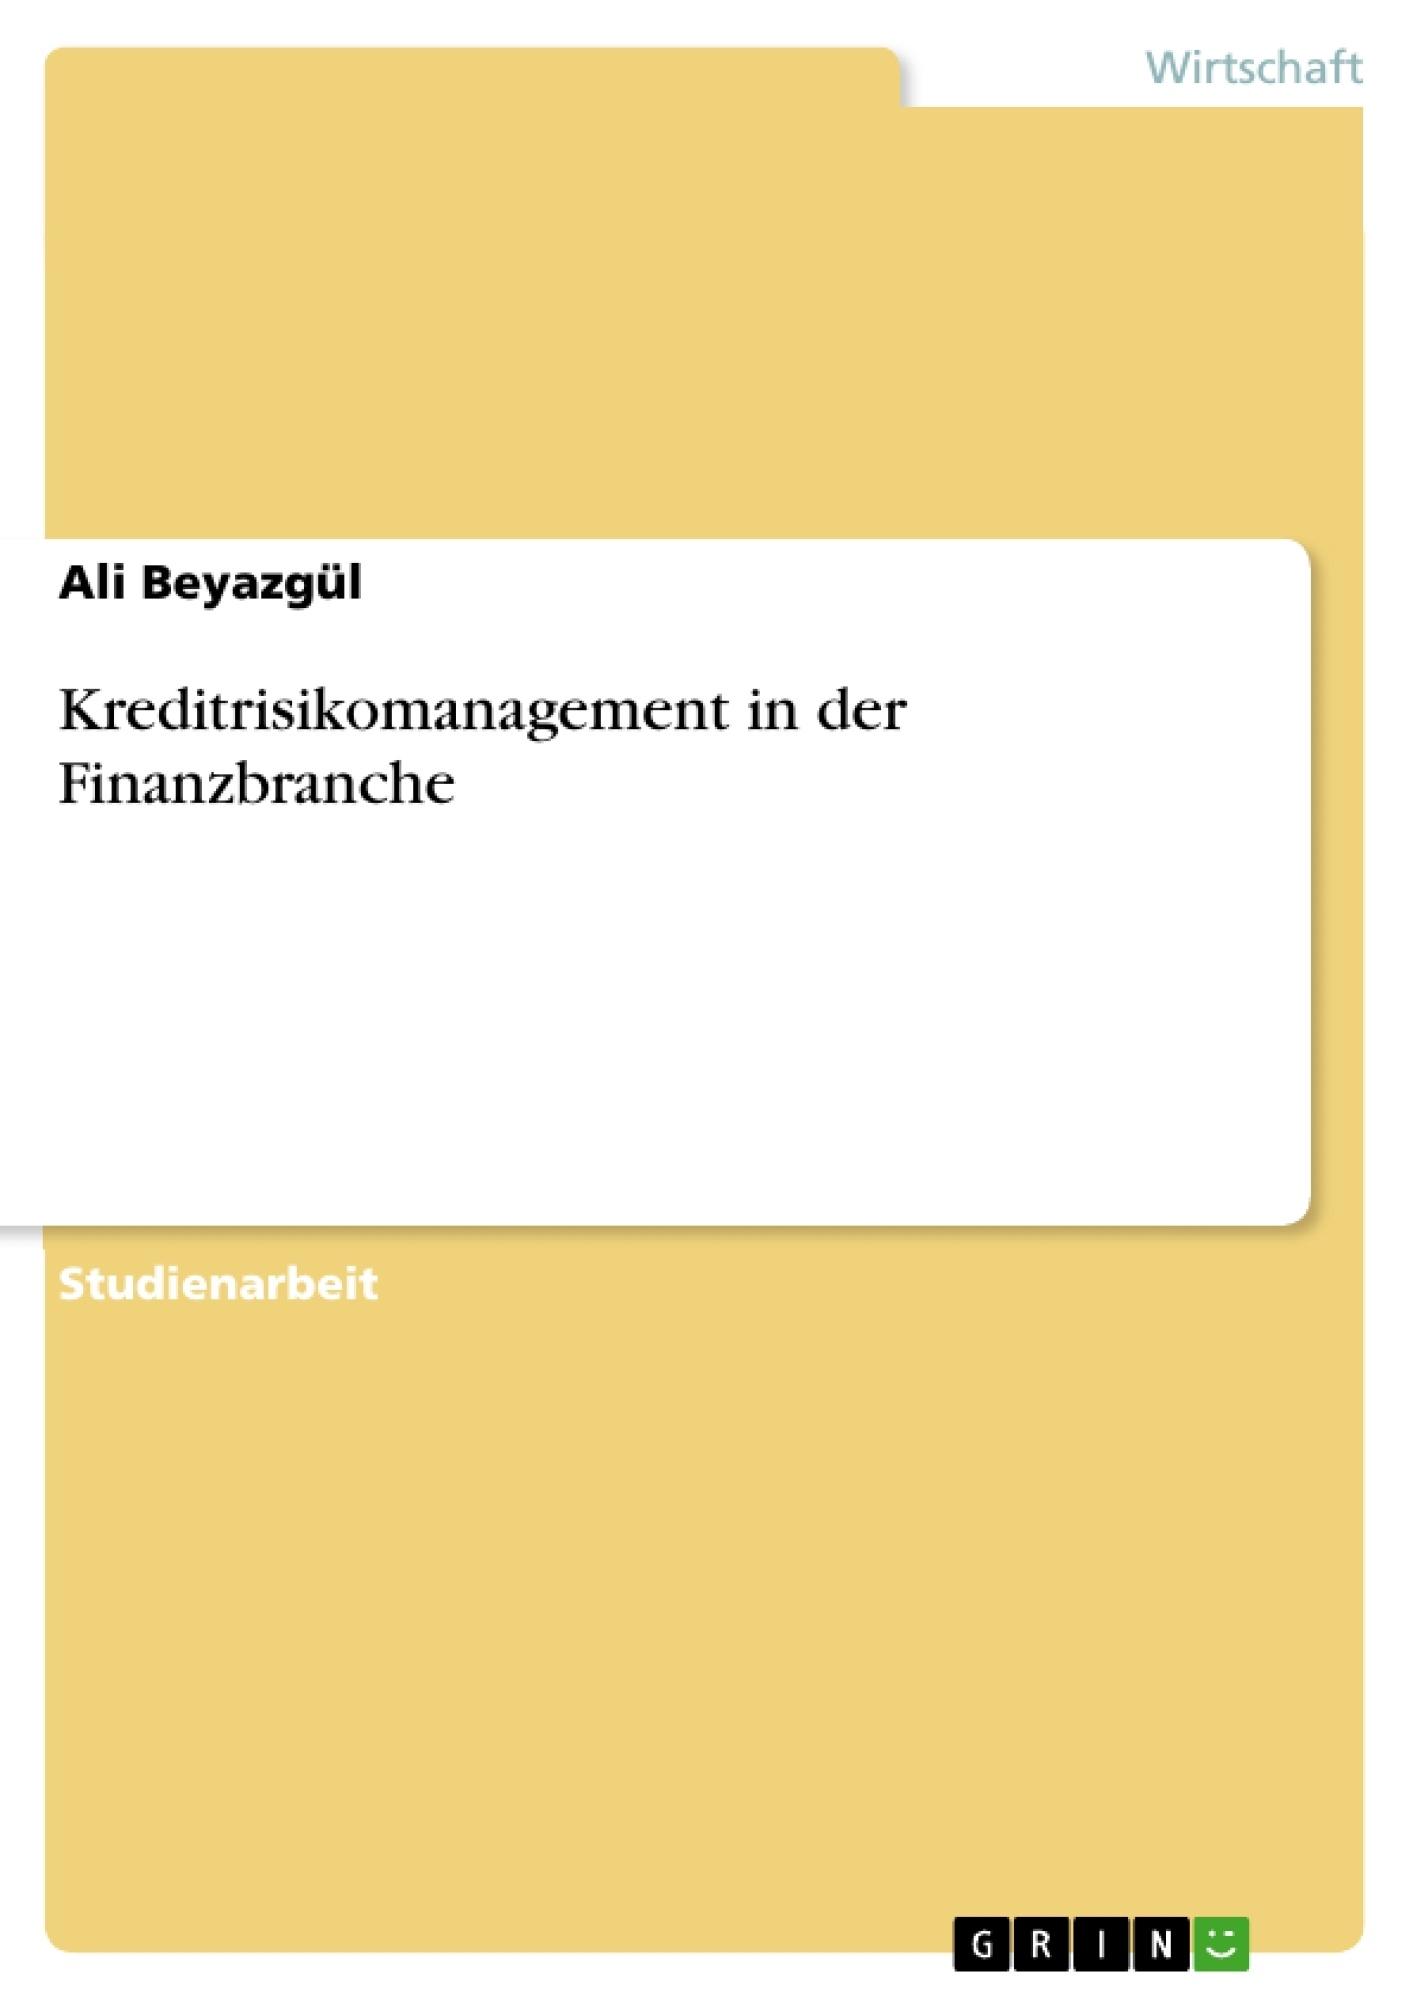 Titel: Kreditrisikomanagement in der Finanzbranche